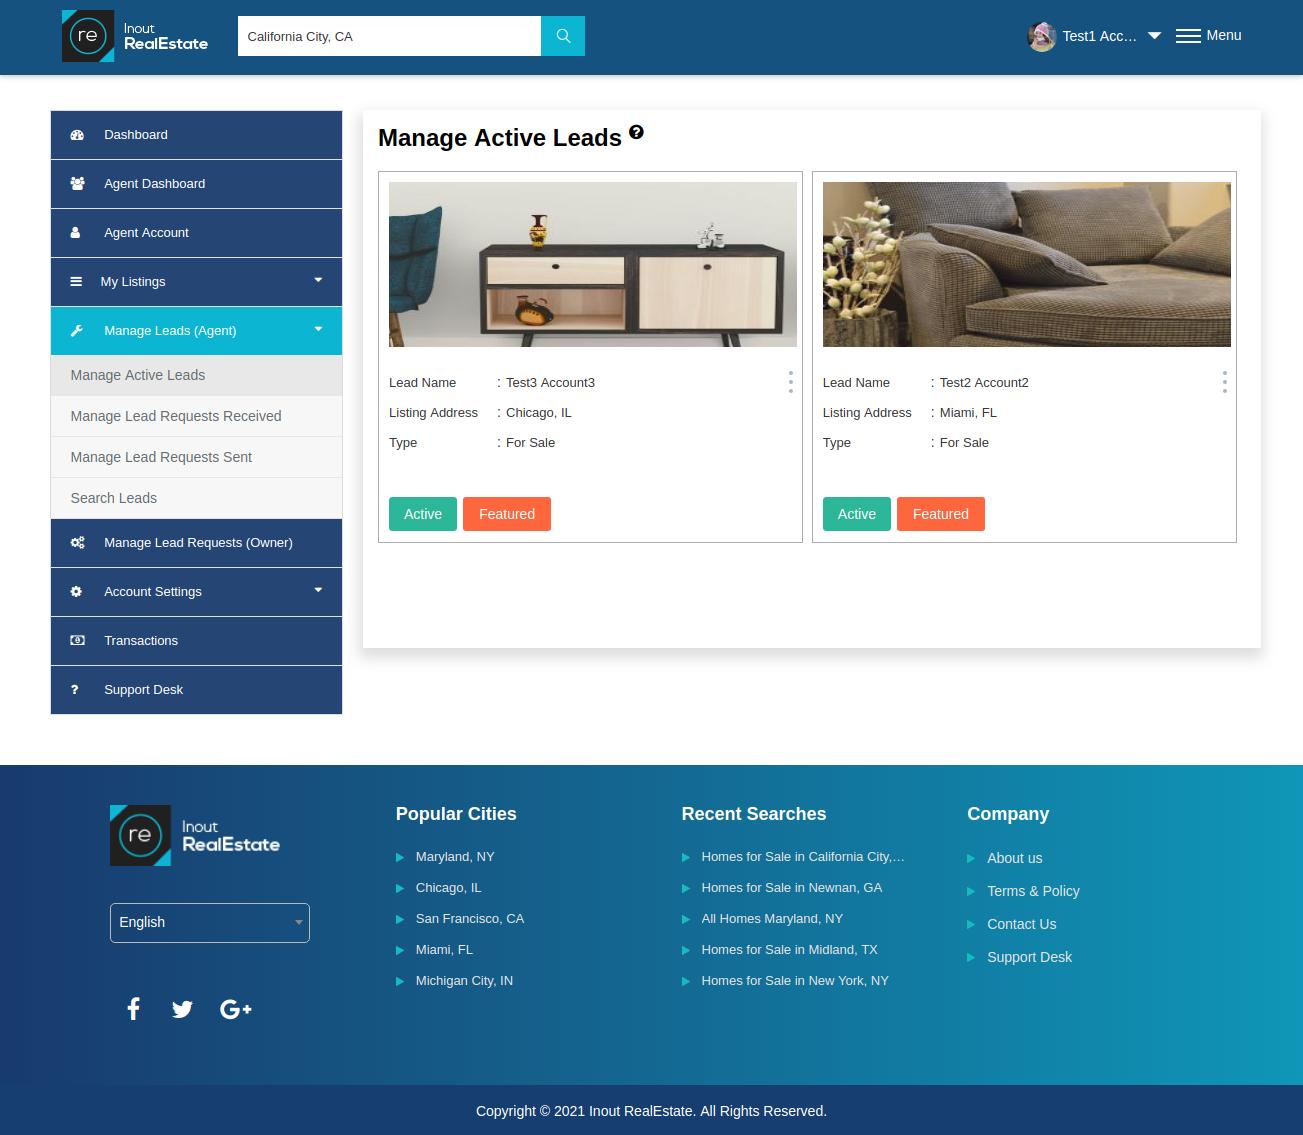 Inout RealEstate - Map Based Advanced Real Estate Portal - Screenshot 6